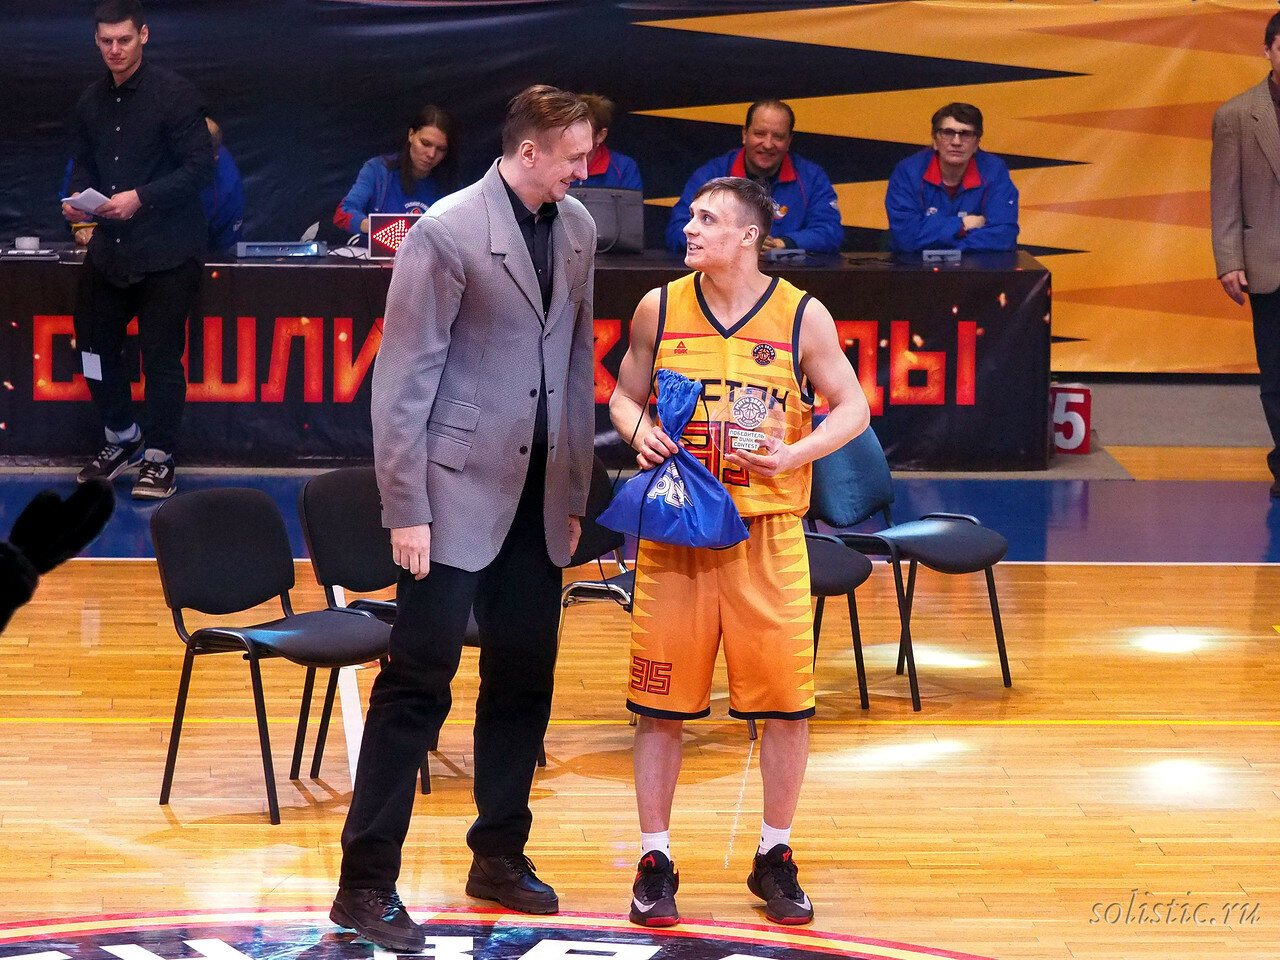 129 Матч звезд АСБ 2018 (ассоциации студенческого баскетбола)